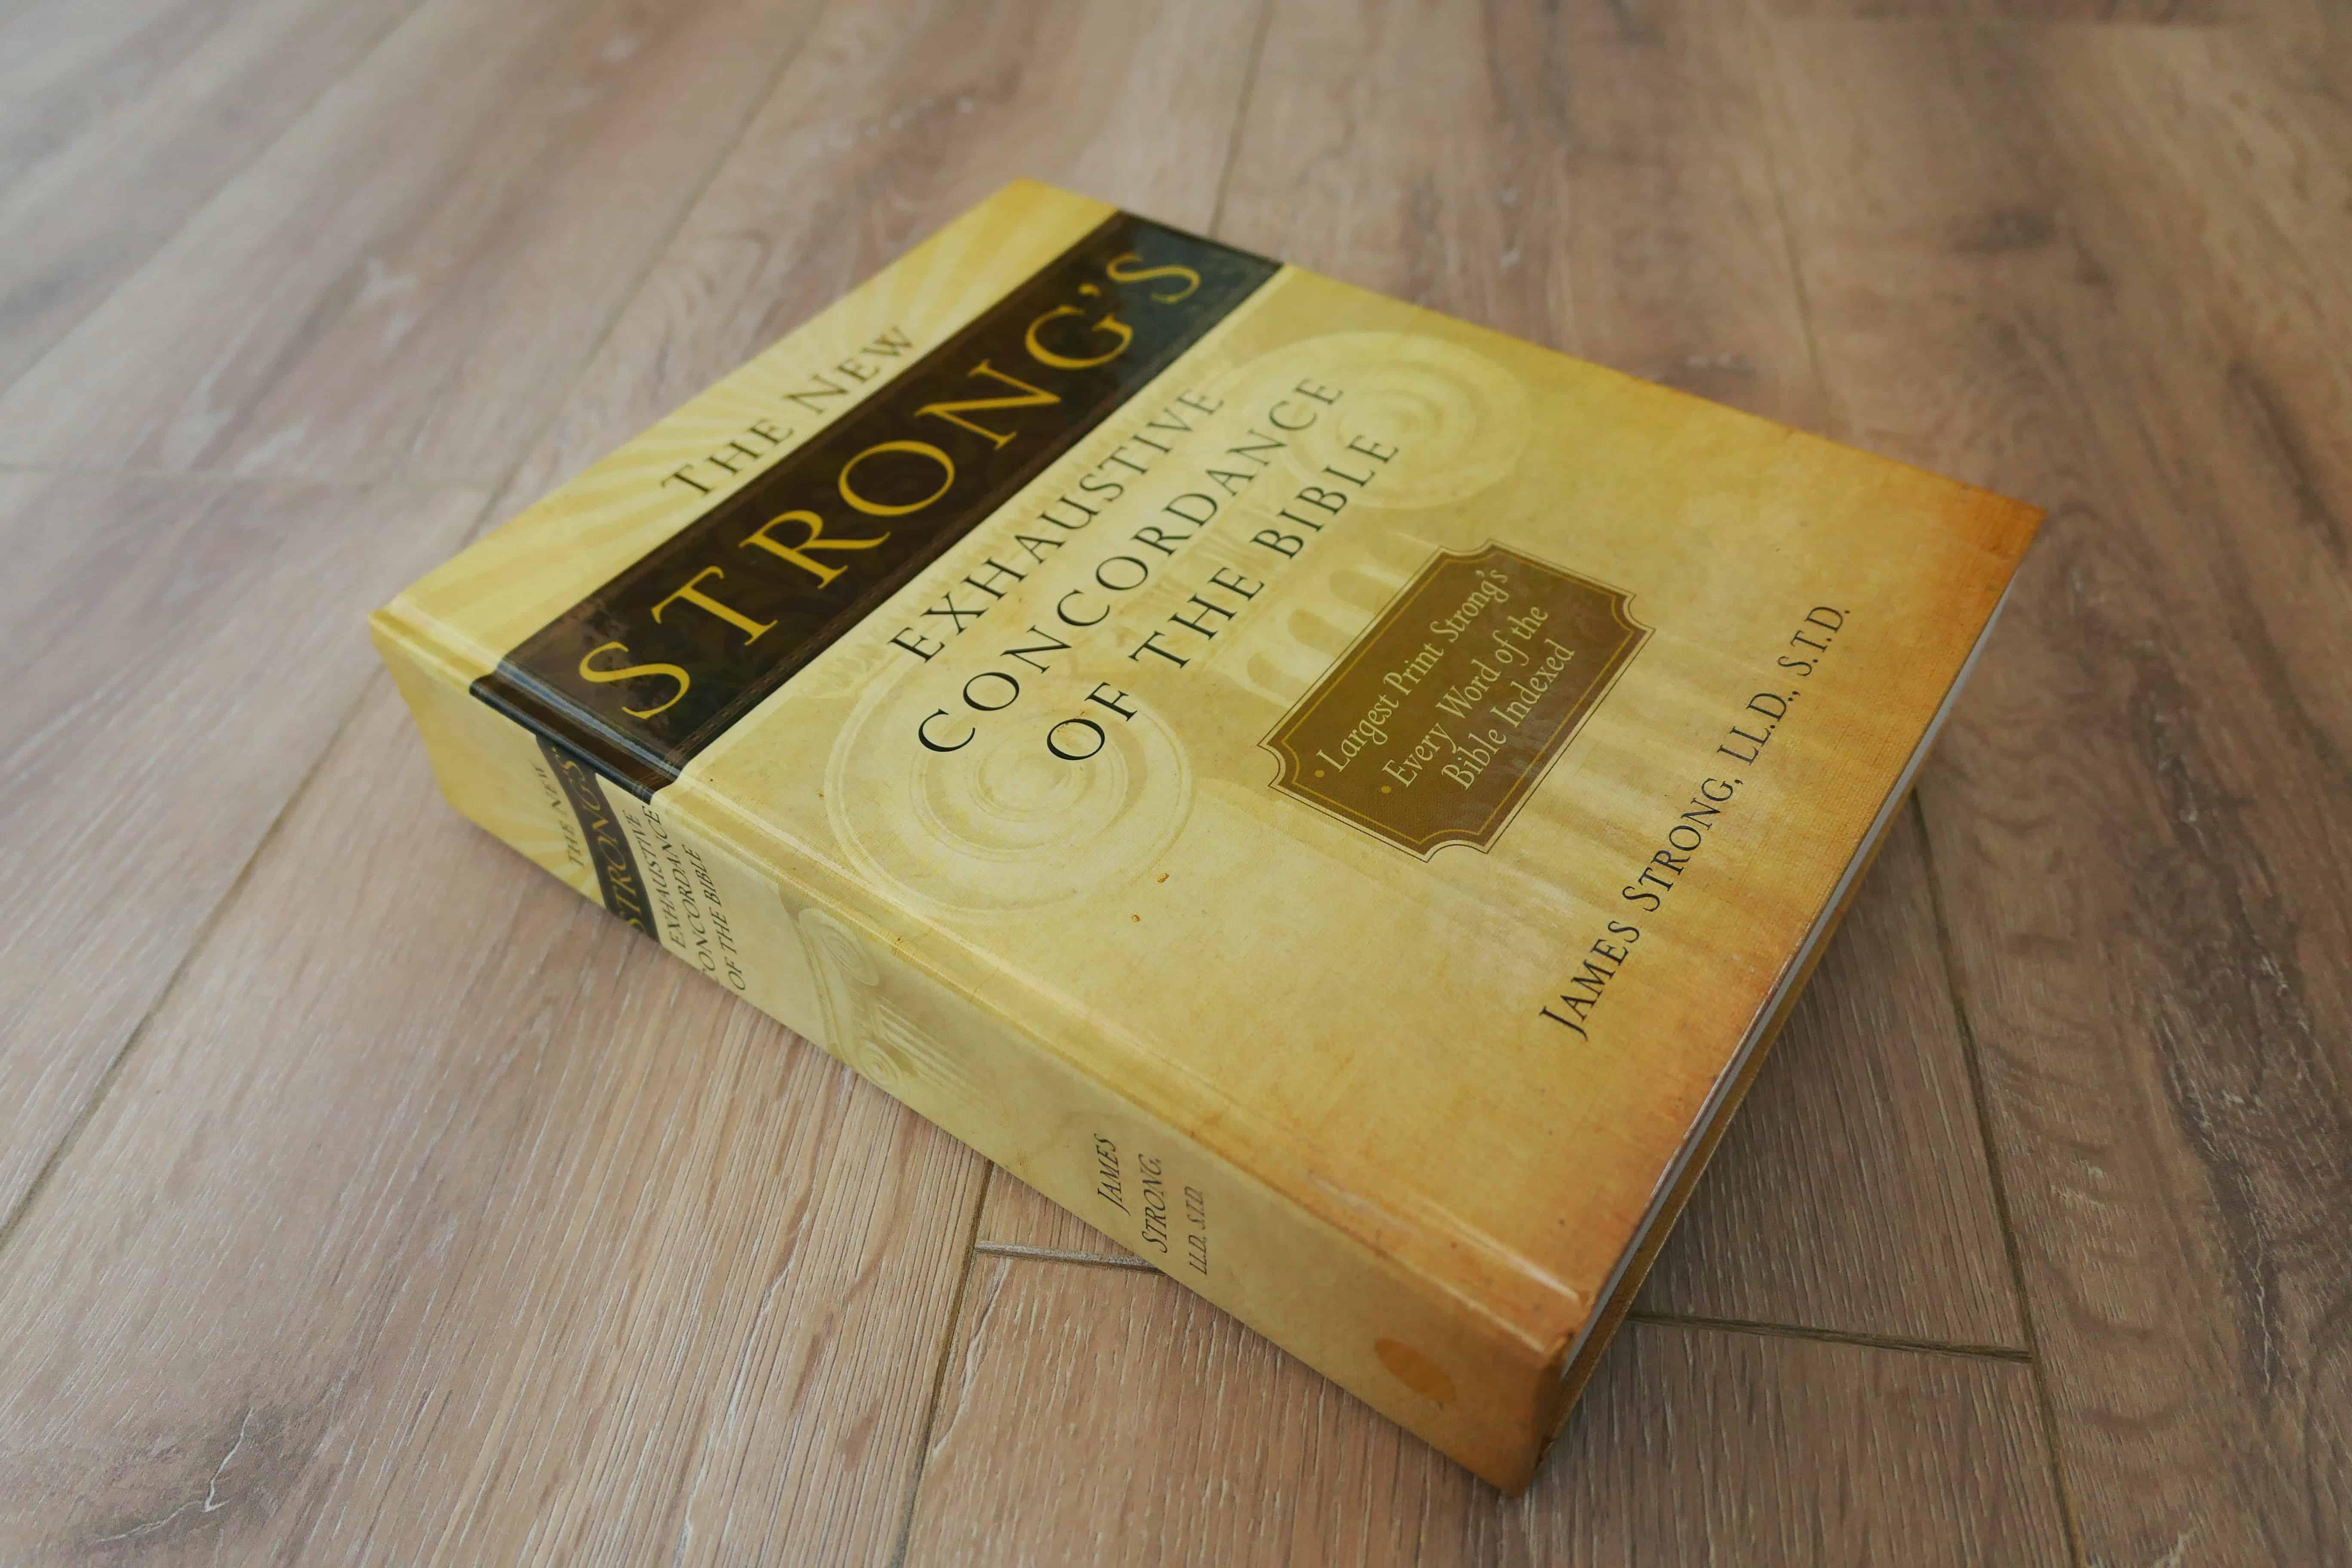 The New Strong's Exhaustive Concordance of the Bible, Concordantie voor KJV 1611 .jpg